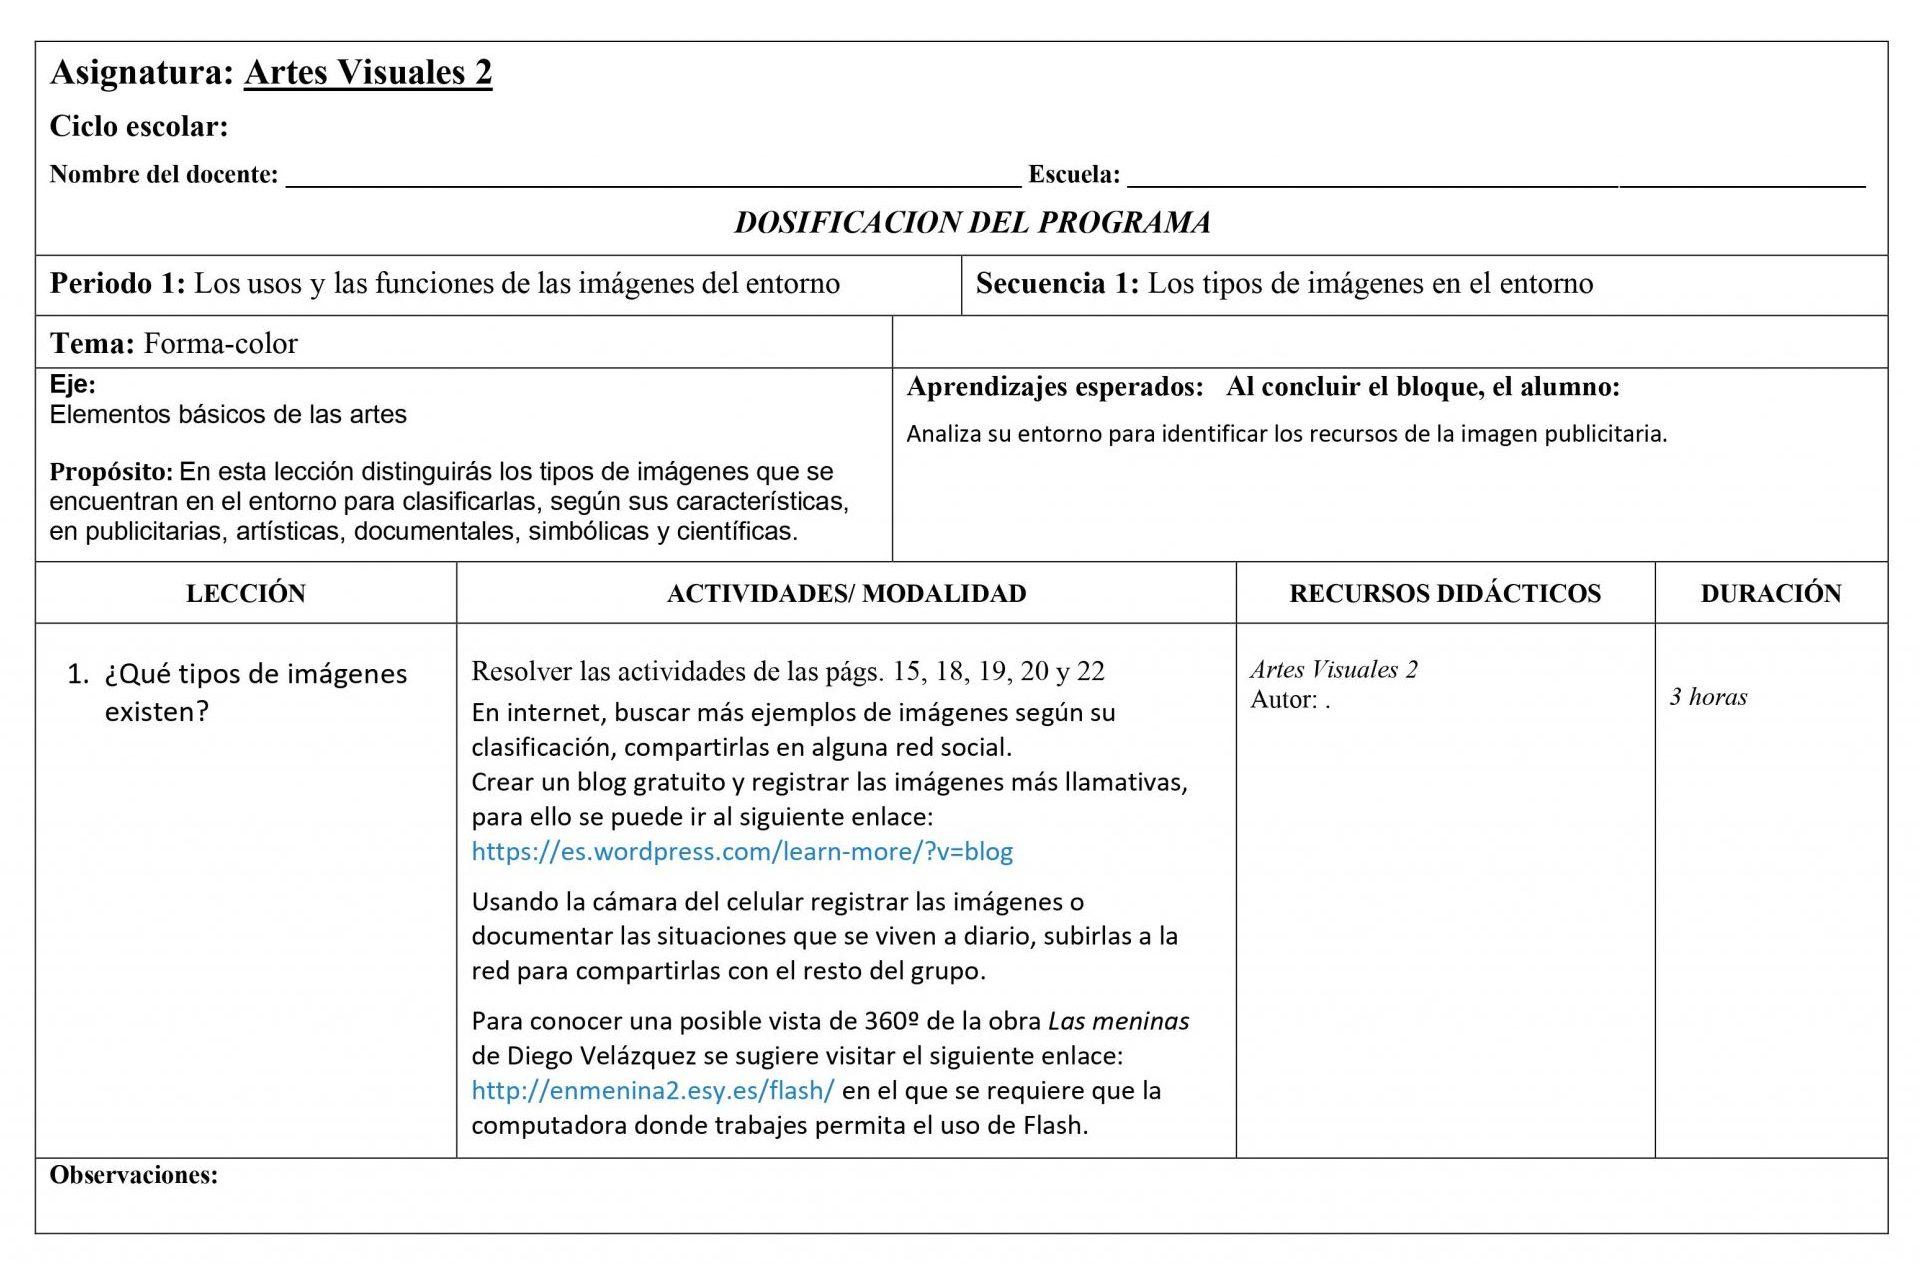 Dosificación Artes Visuales 2 Secundaria (Nuevo Modelo Educativo) 1er. Trimestre 01